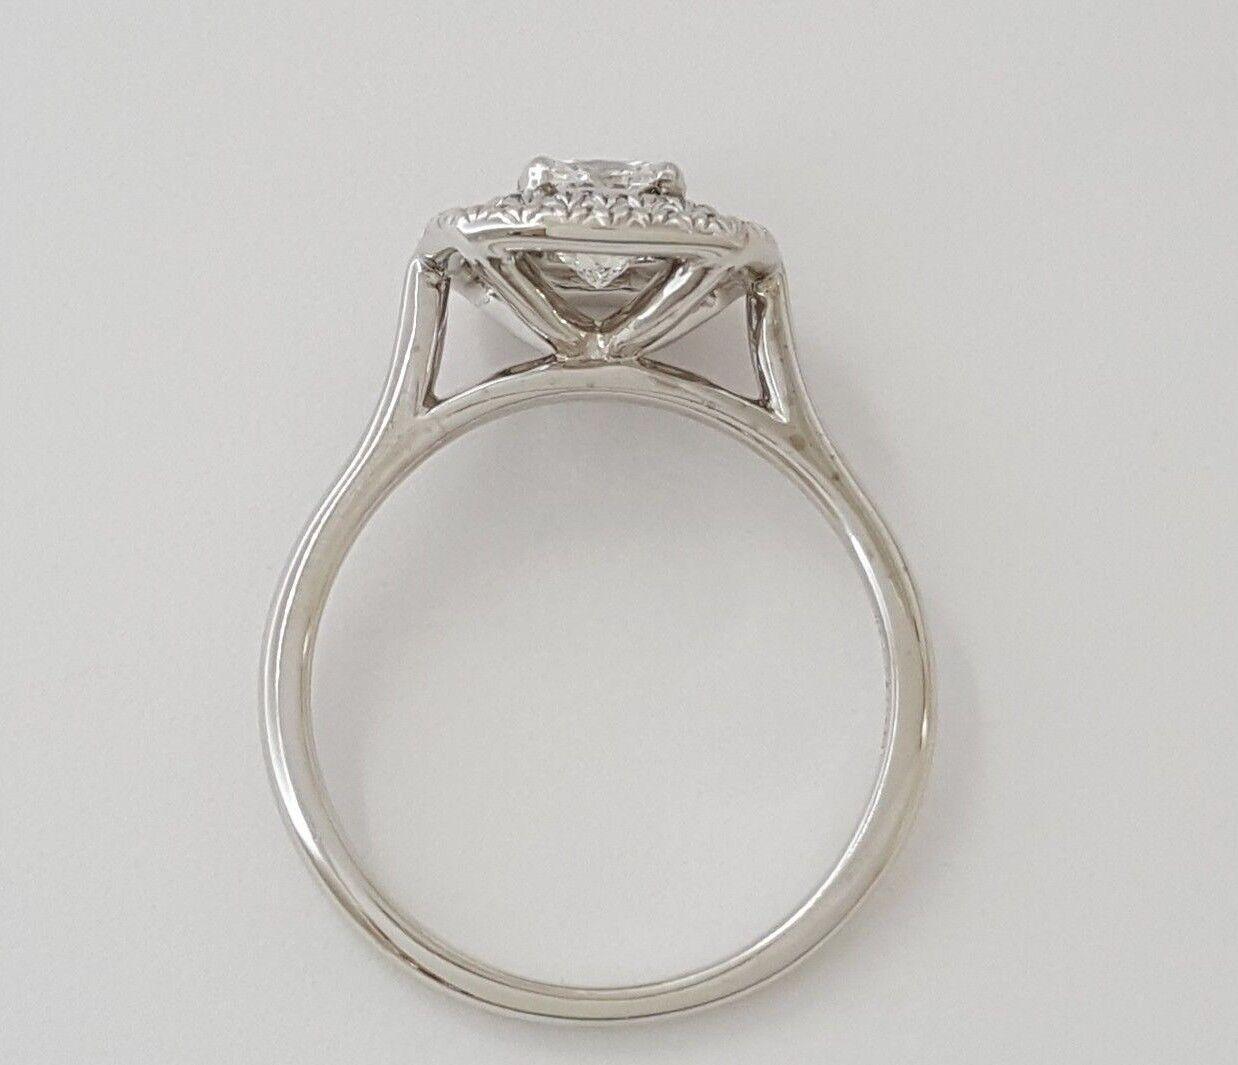 0.97 ct 18K White Gold Cushion Cut Diamond Double Halo Engagement Ring GIA E/VS1 7